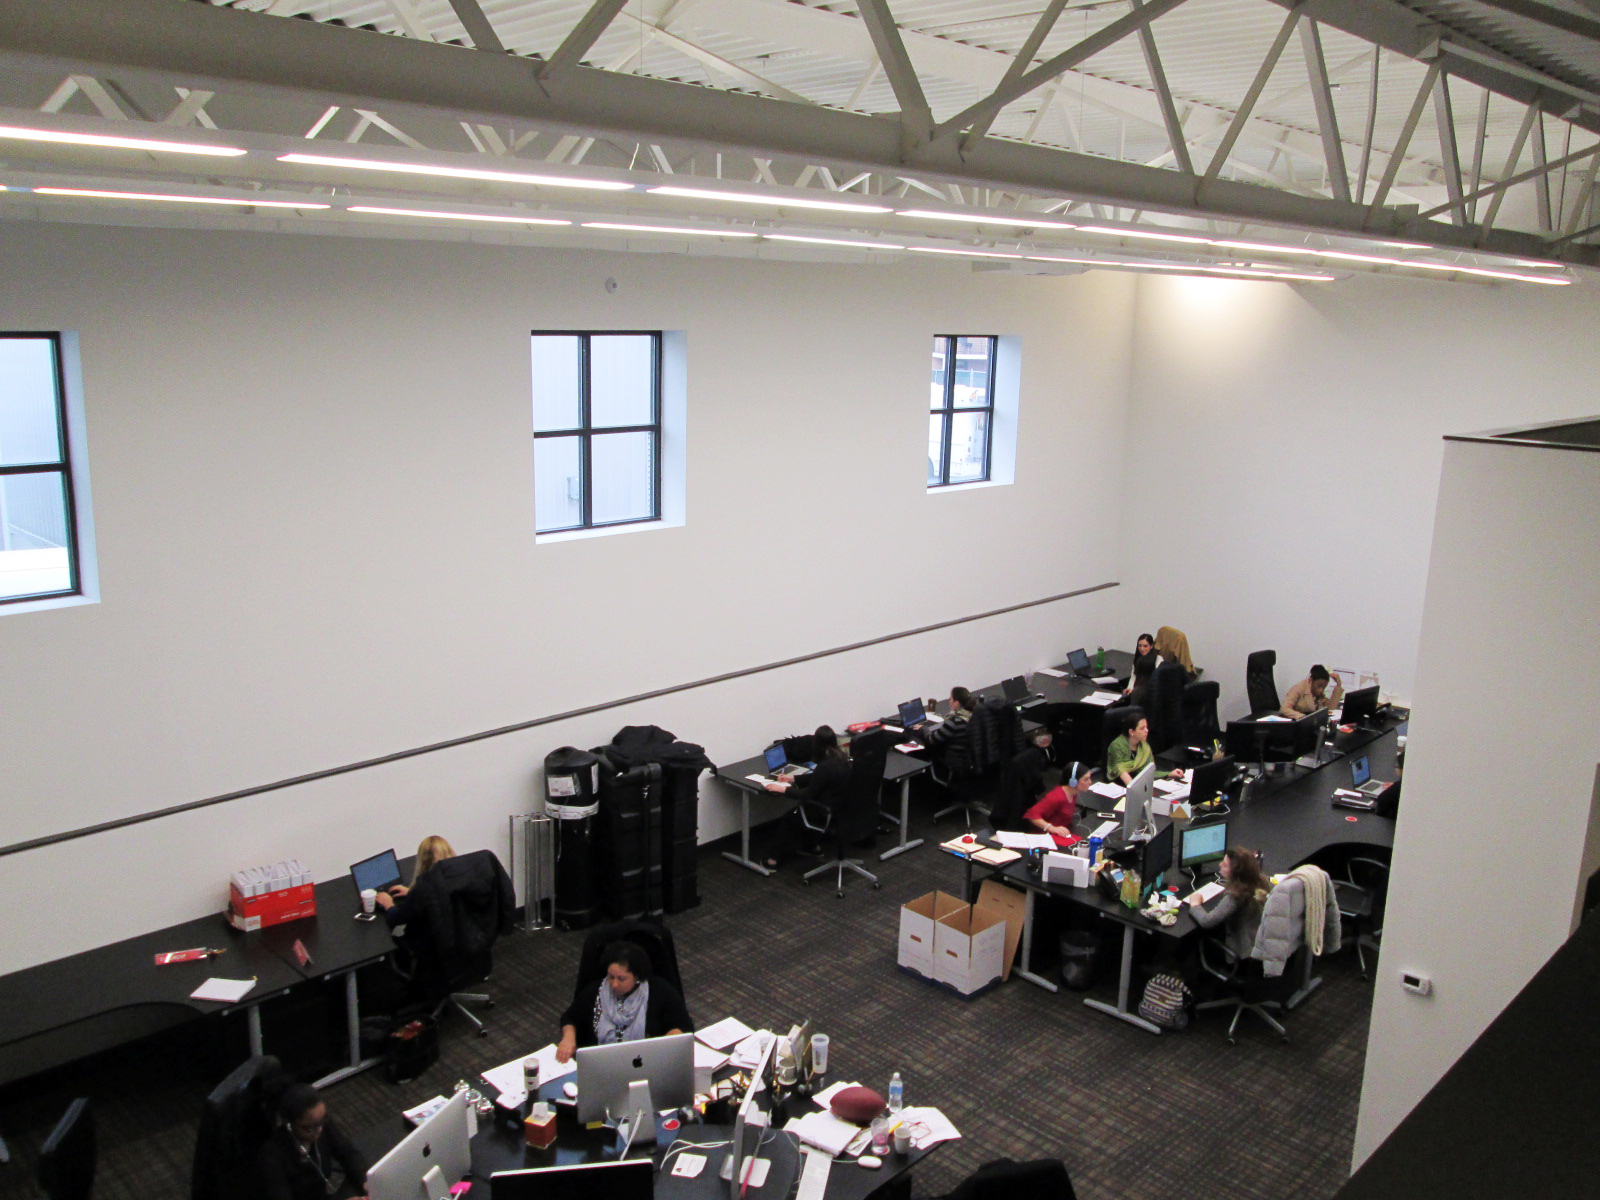 Back workspace